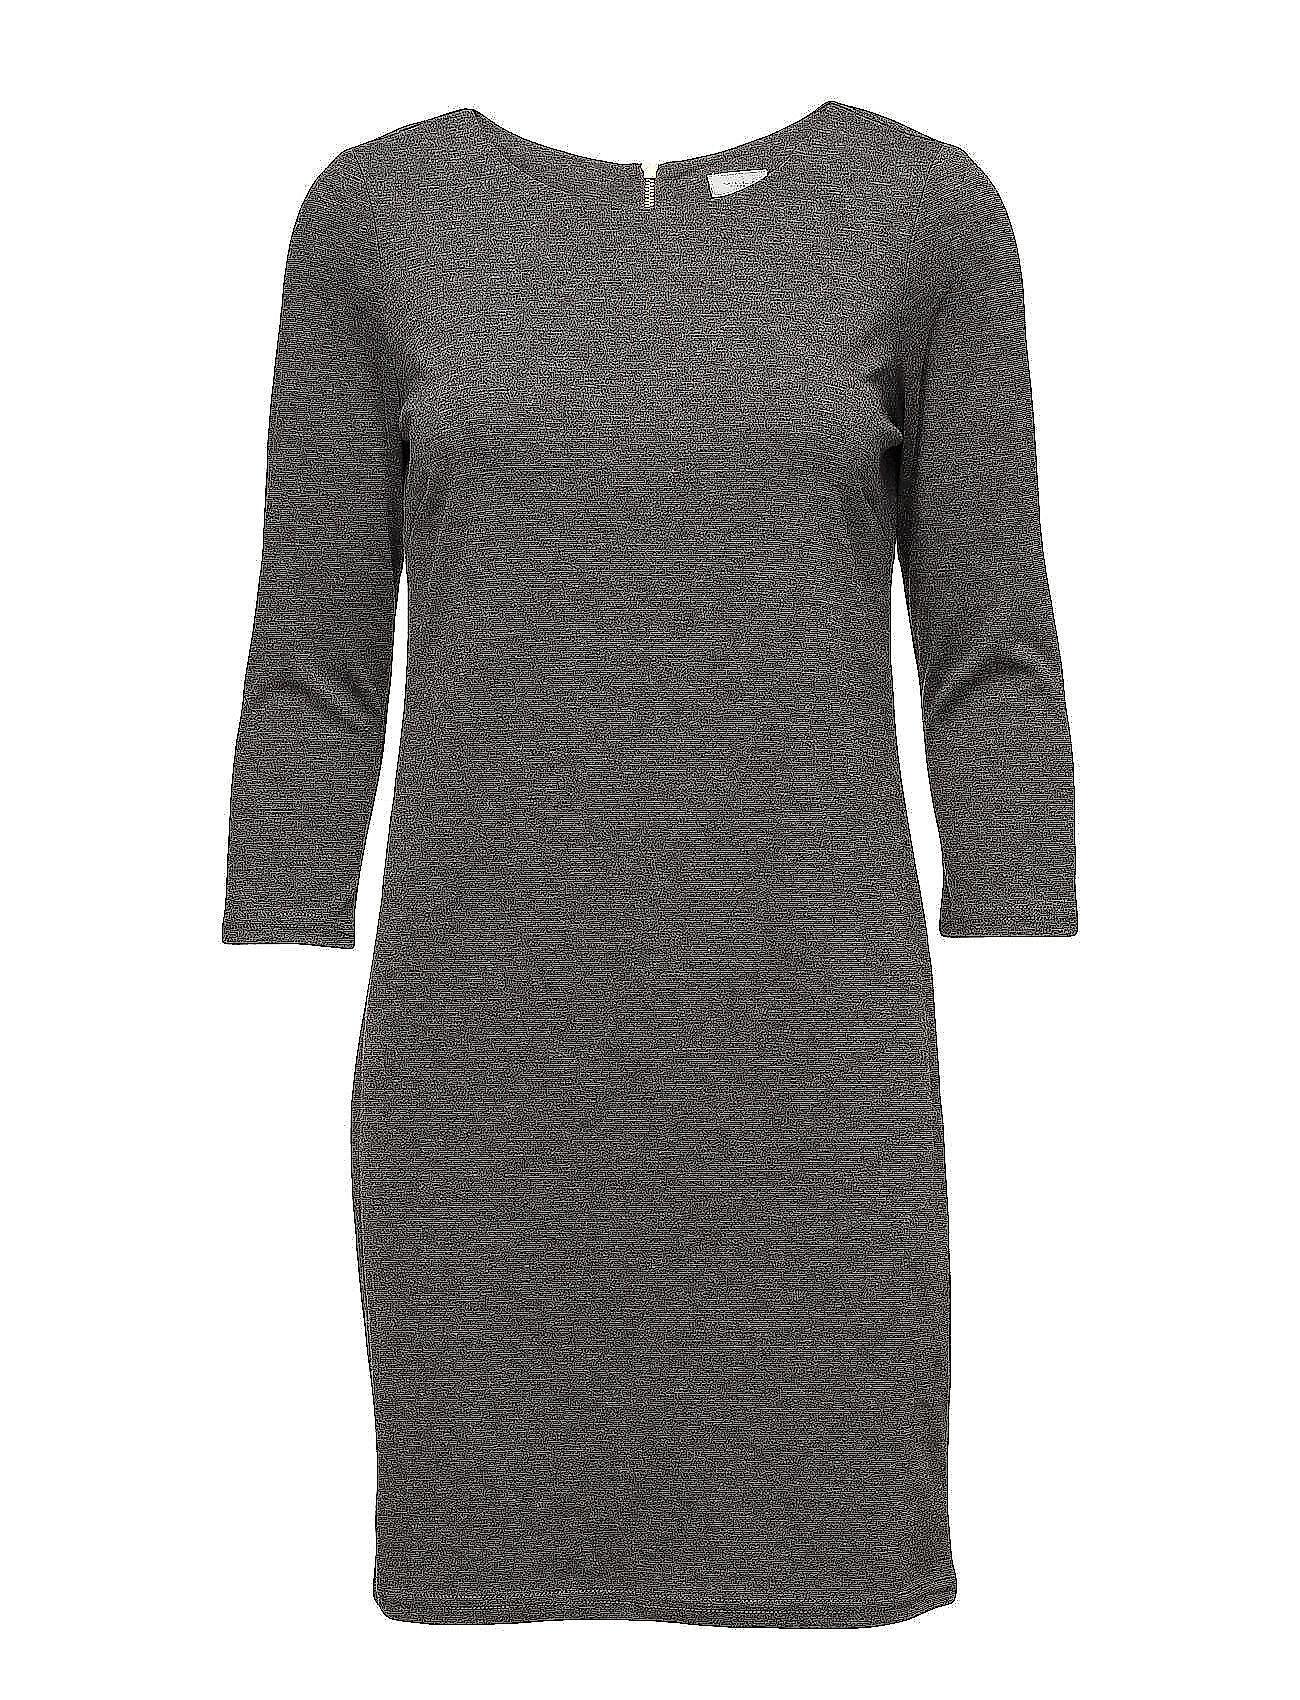 Image of VILA Vitinny New Dress-Noos Lyhyt Mekko Harmaa VILA